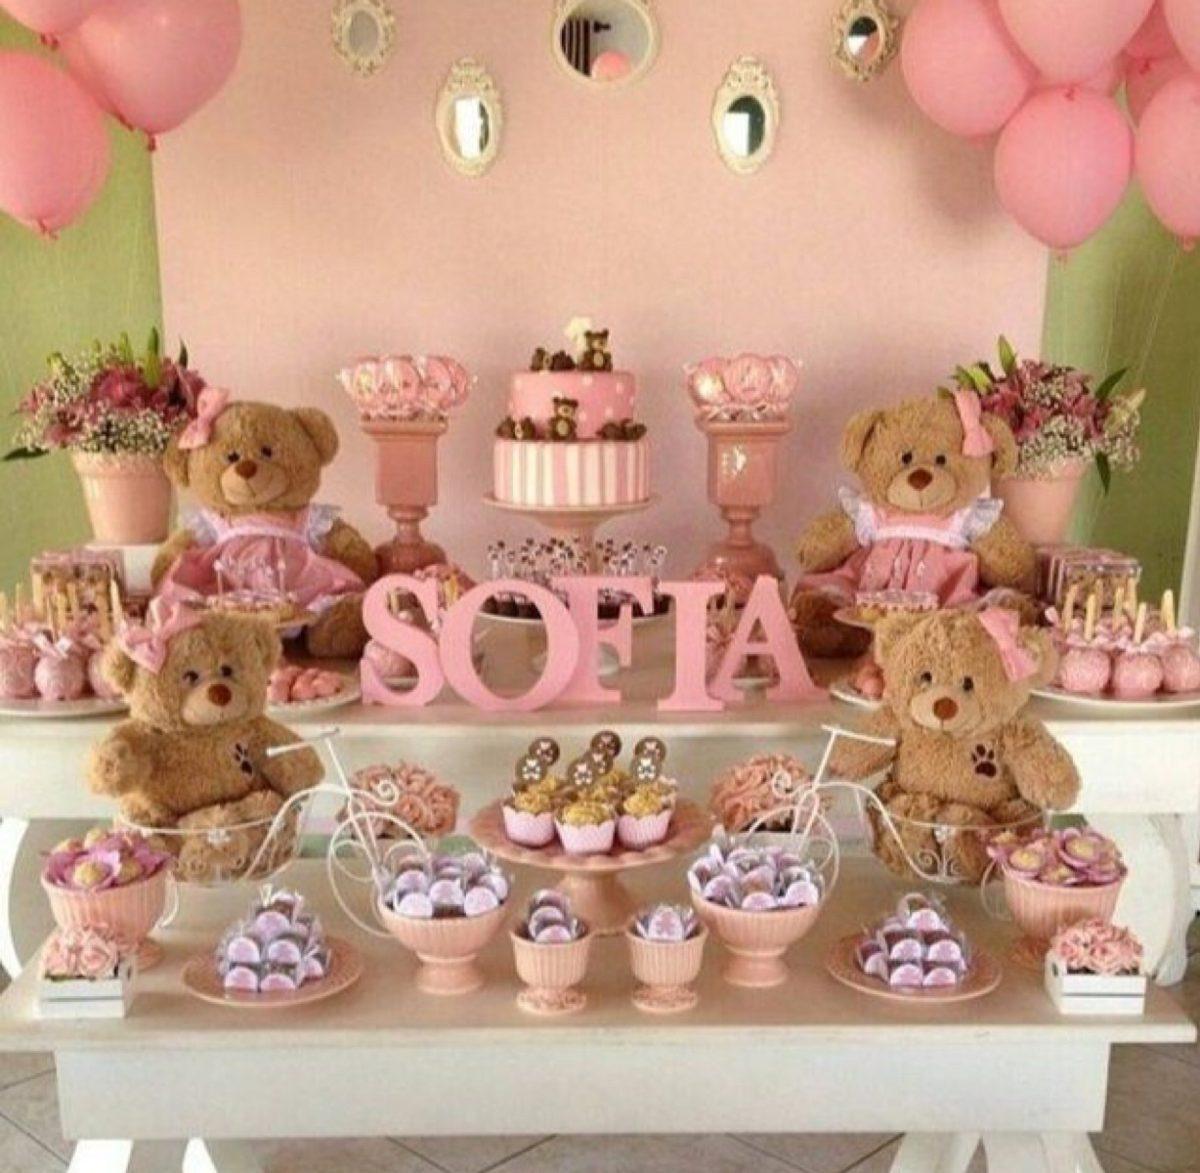 Mesa de dulces fiesta cumplea os bautizo baby shower boda - Hacer mesa dulce bautizo ...